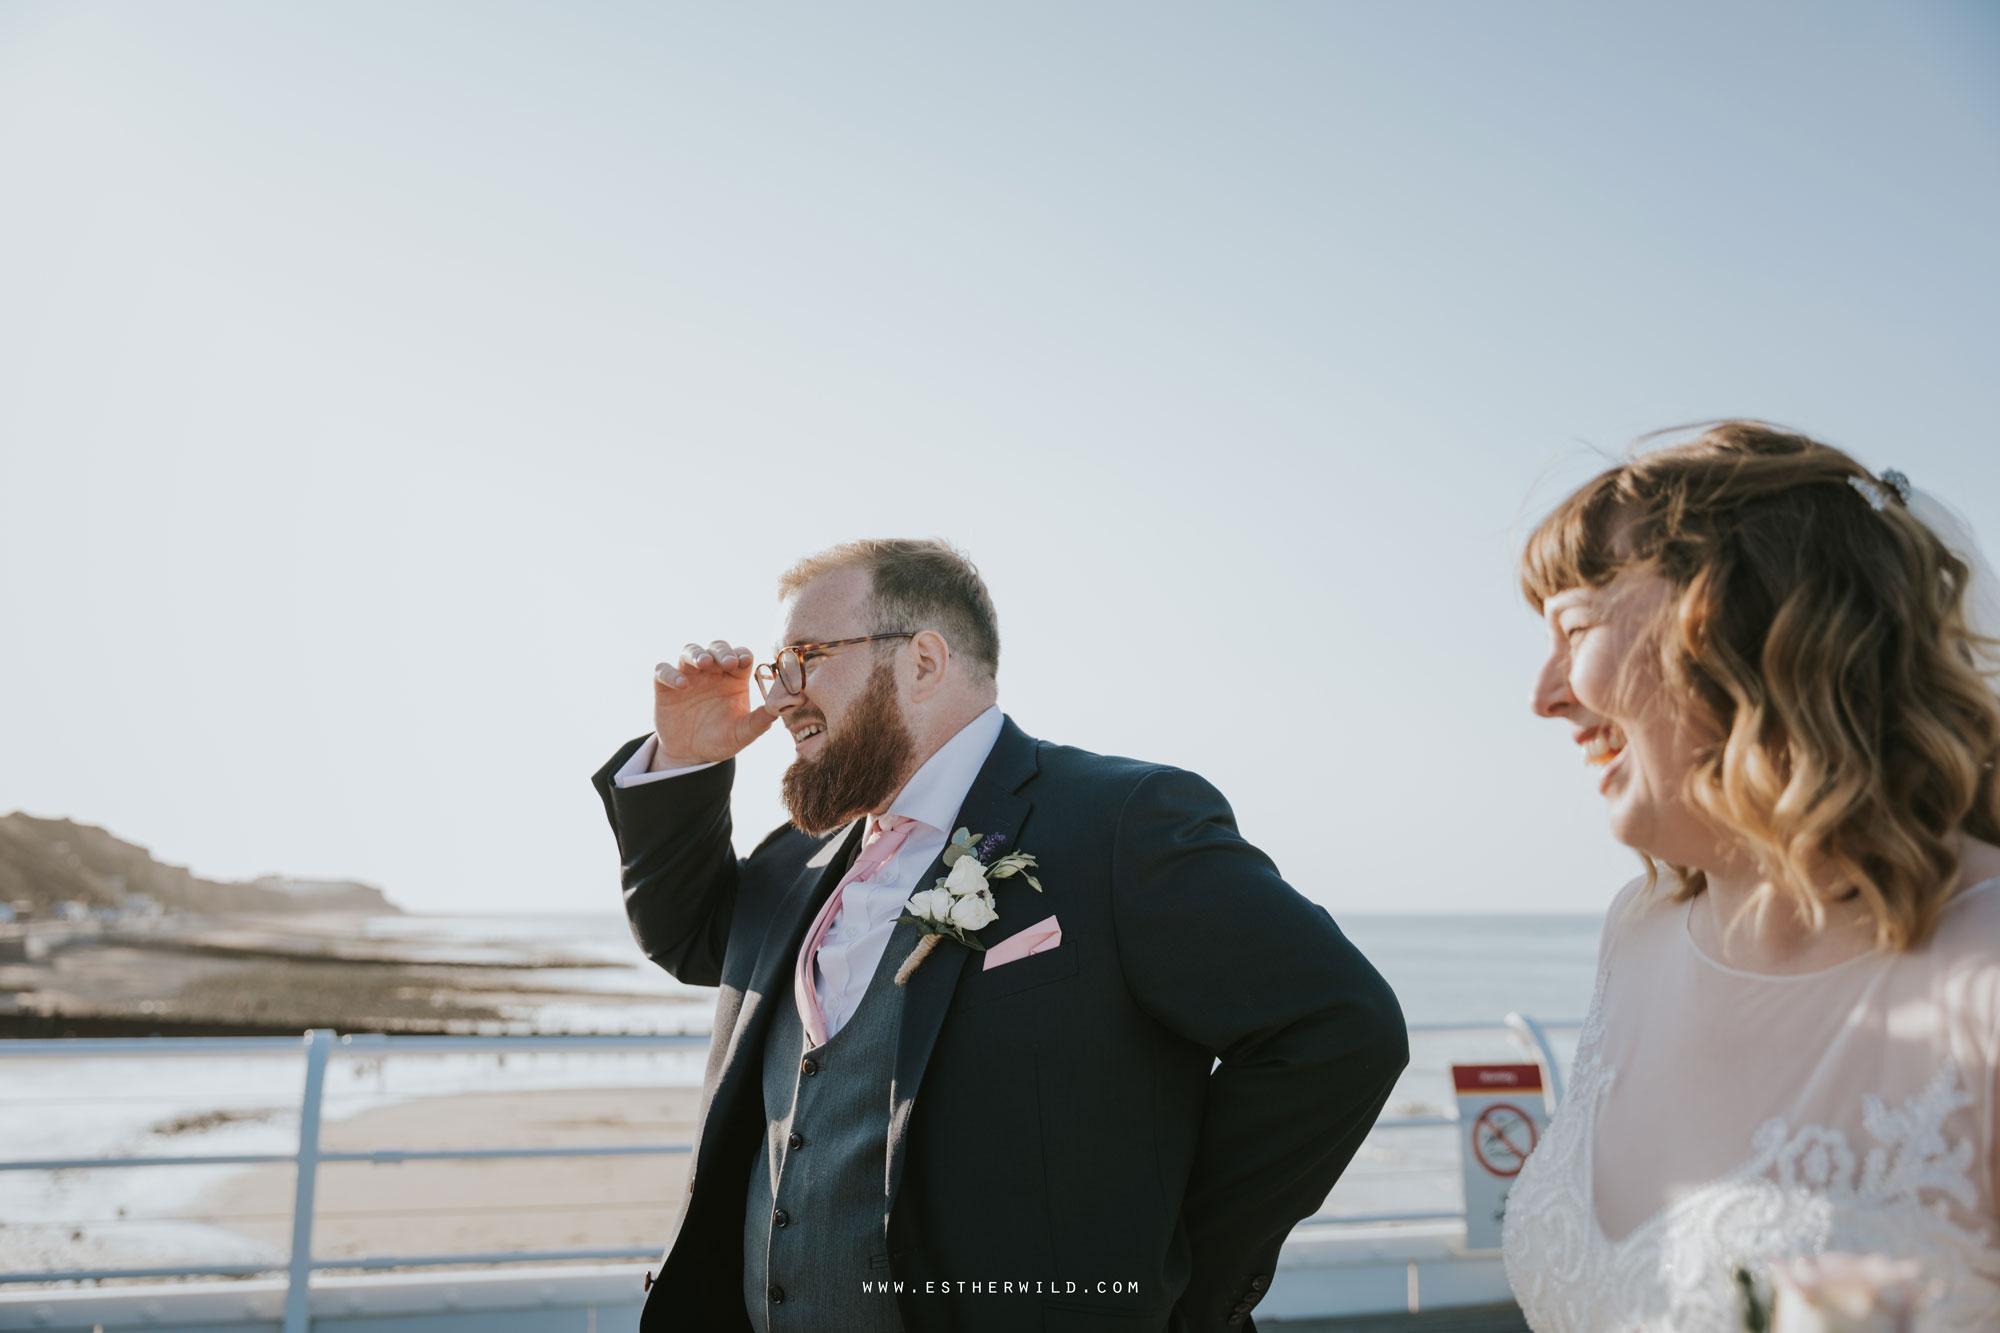 Cromer_Wedding_Beach_Outdoor_Ceremony_Norfolk_North_Lodge_Registry_Office_Rocket_House_Cafe_Cromer_Pier_IMG_4685.jpg